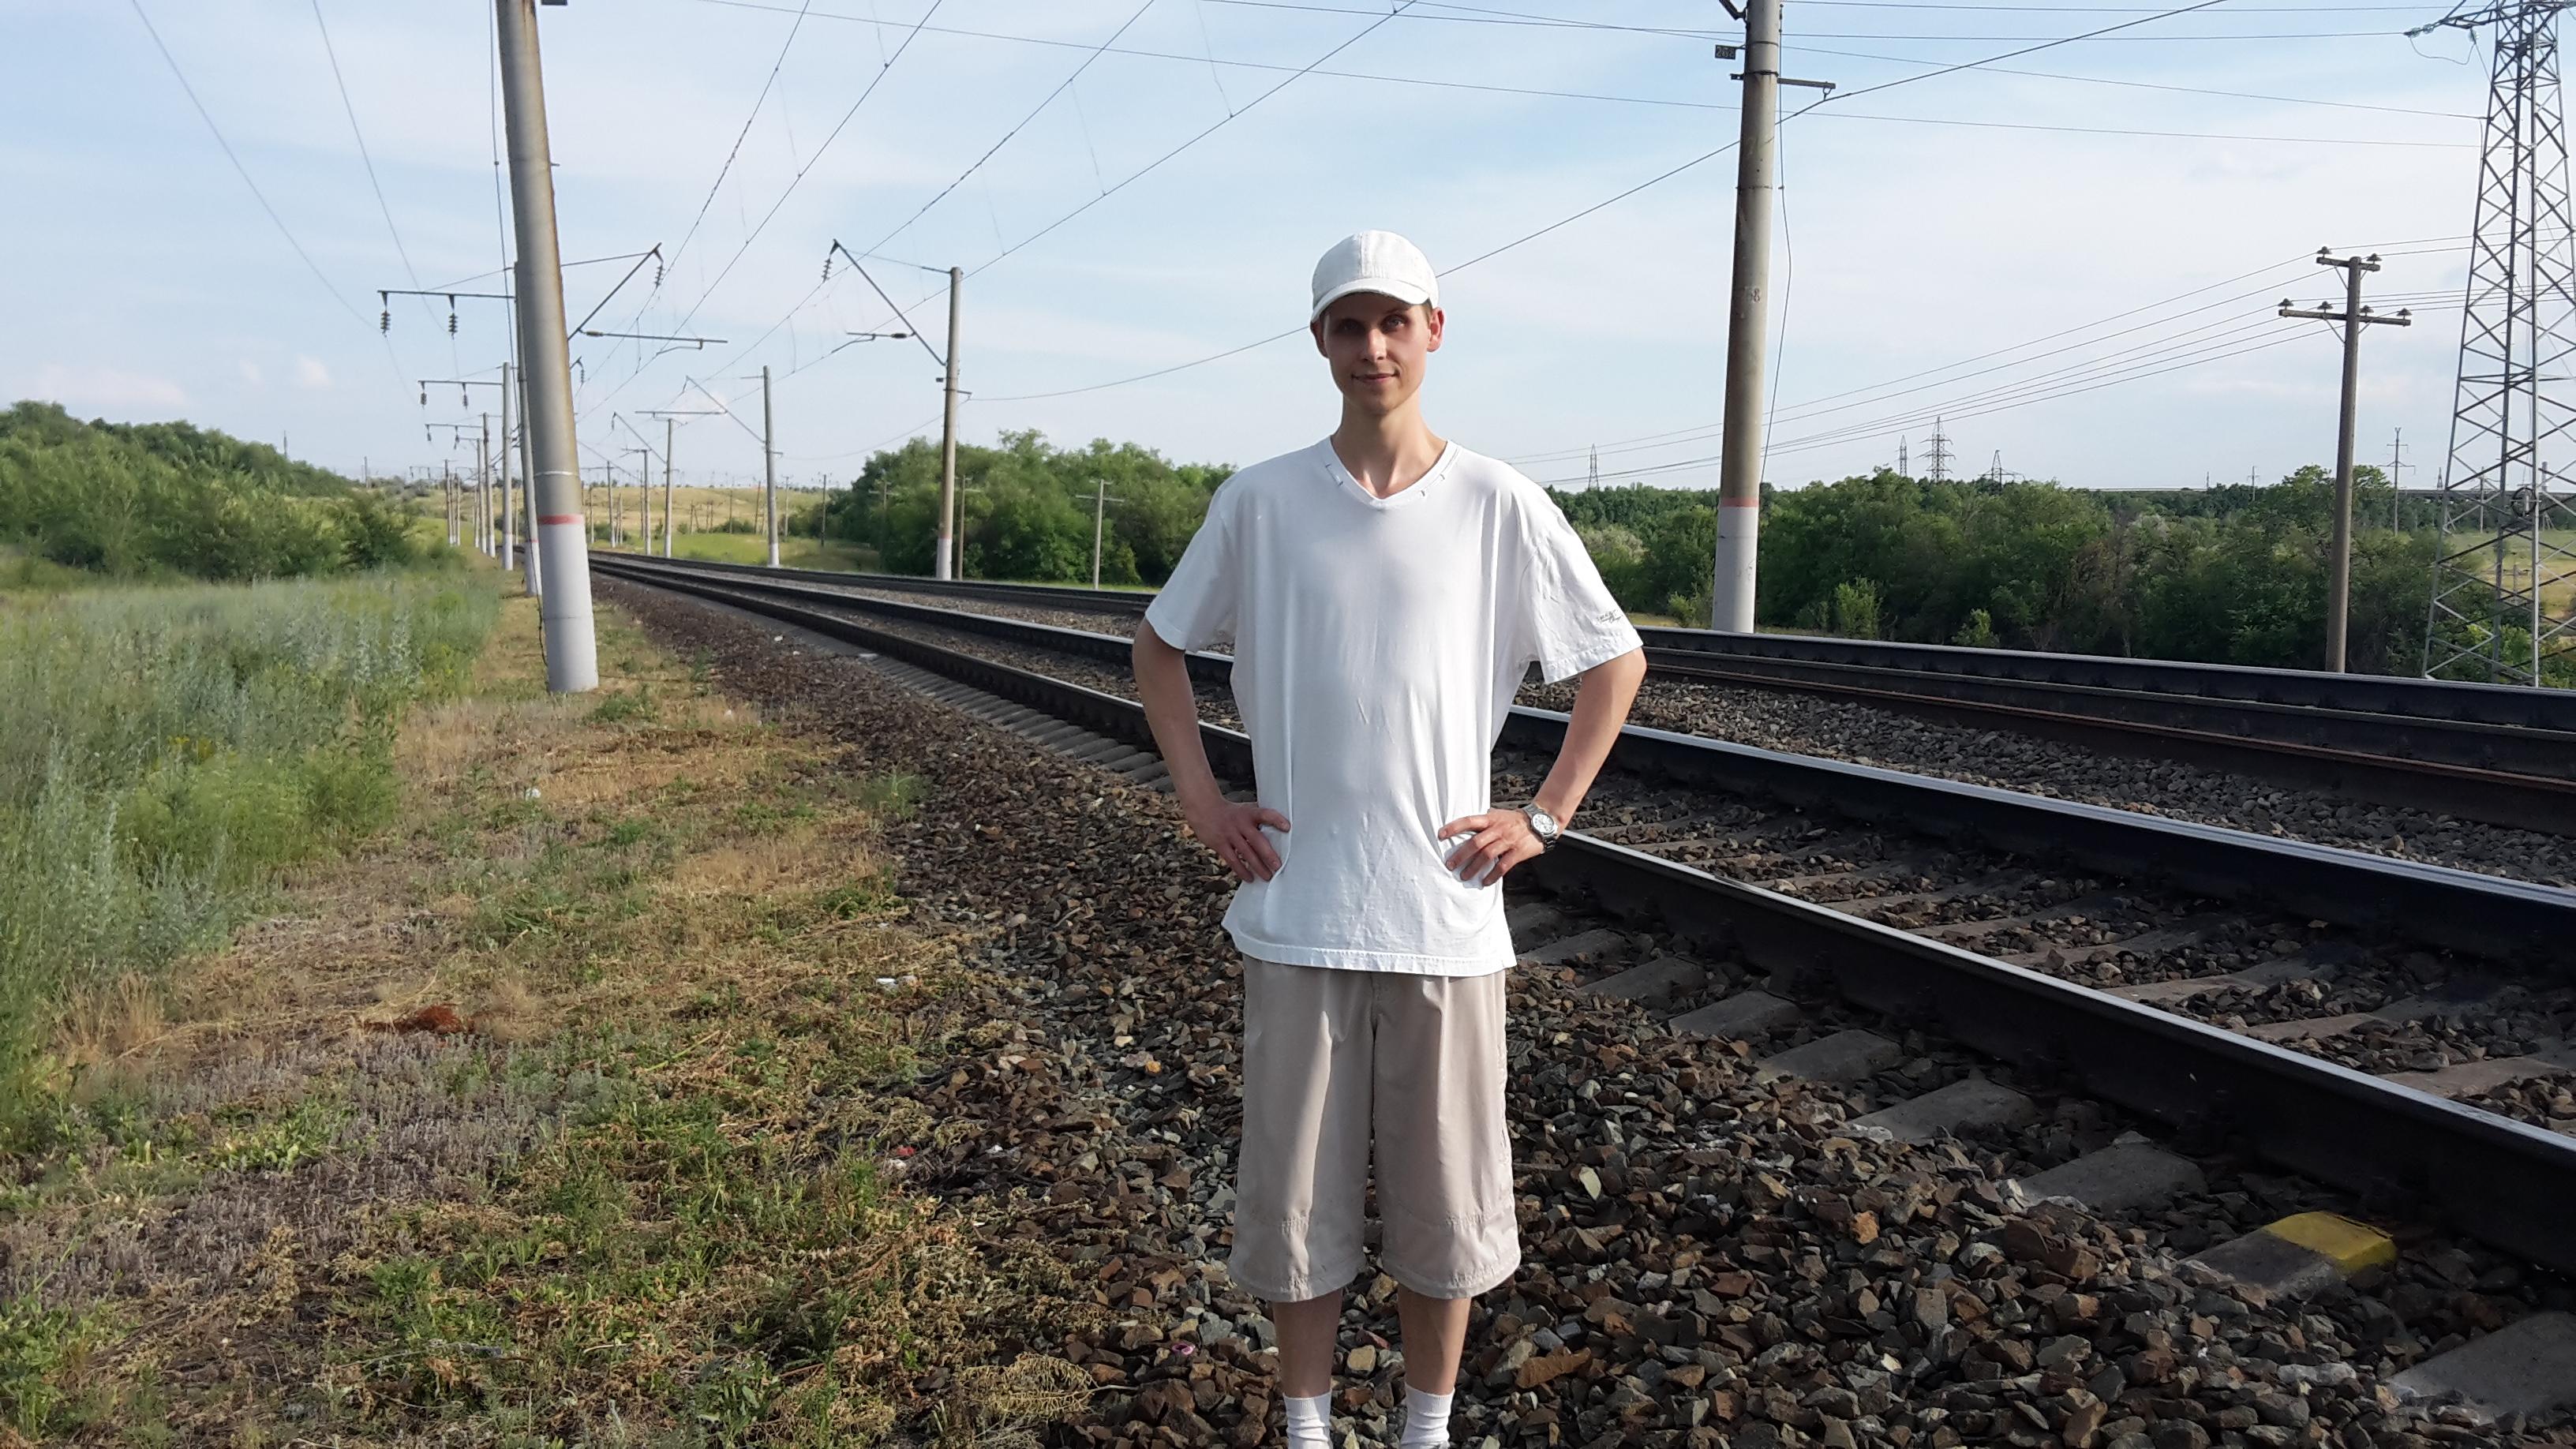 я на железной дороге около поселка Дубки